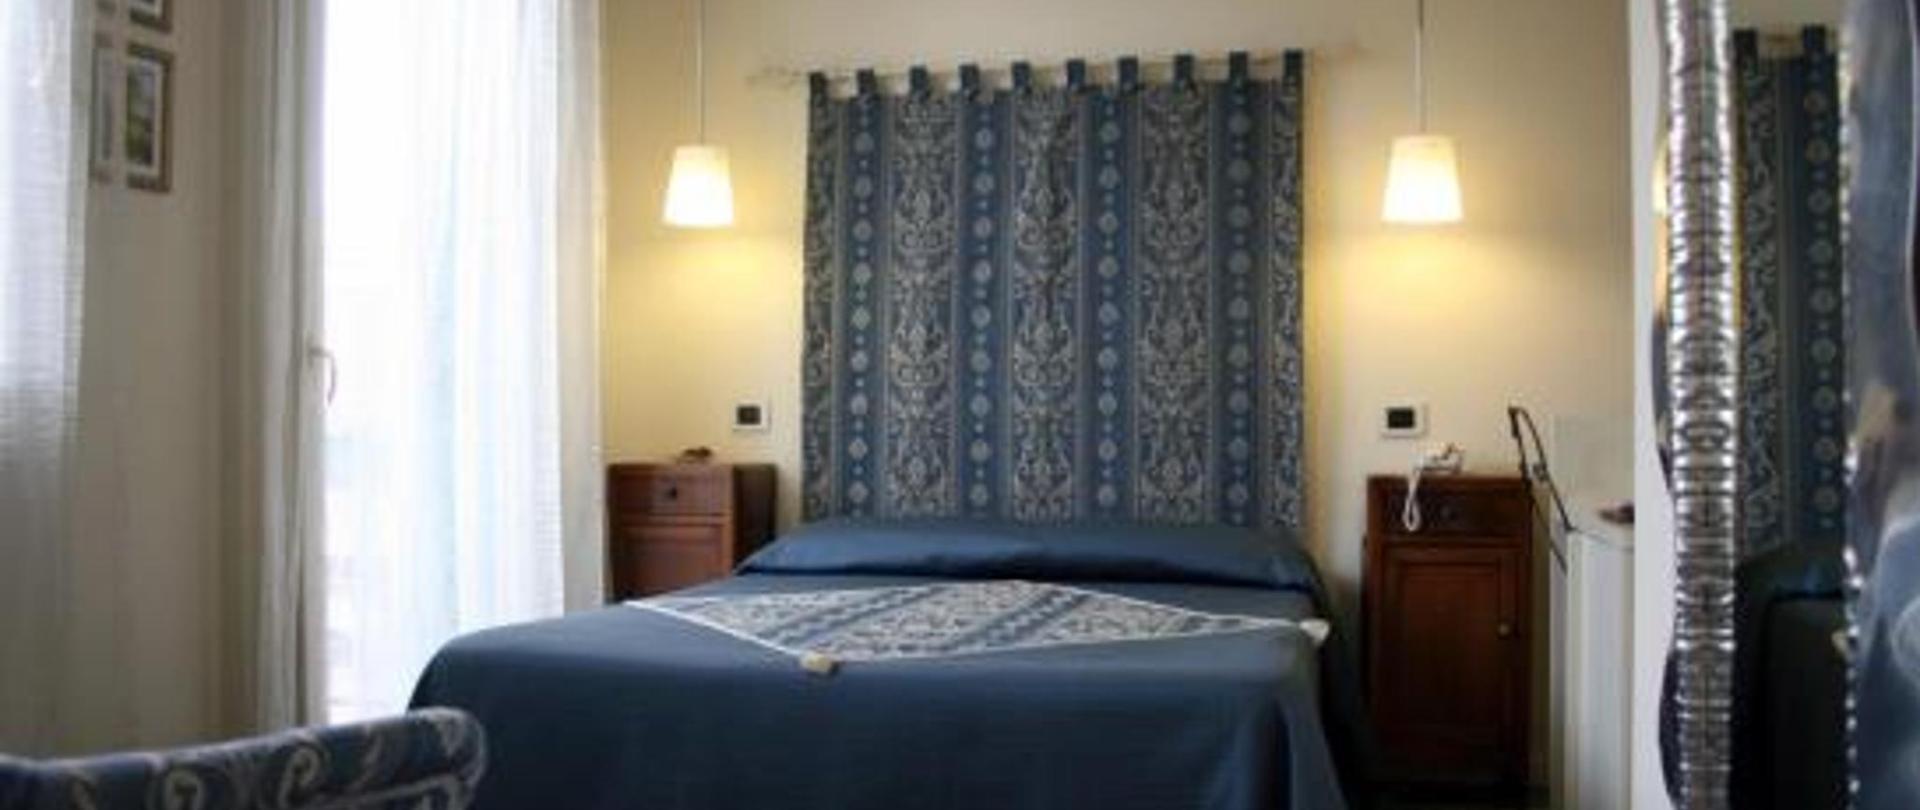 hotelli-Cristina-Vicenza-015.jpg